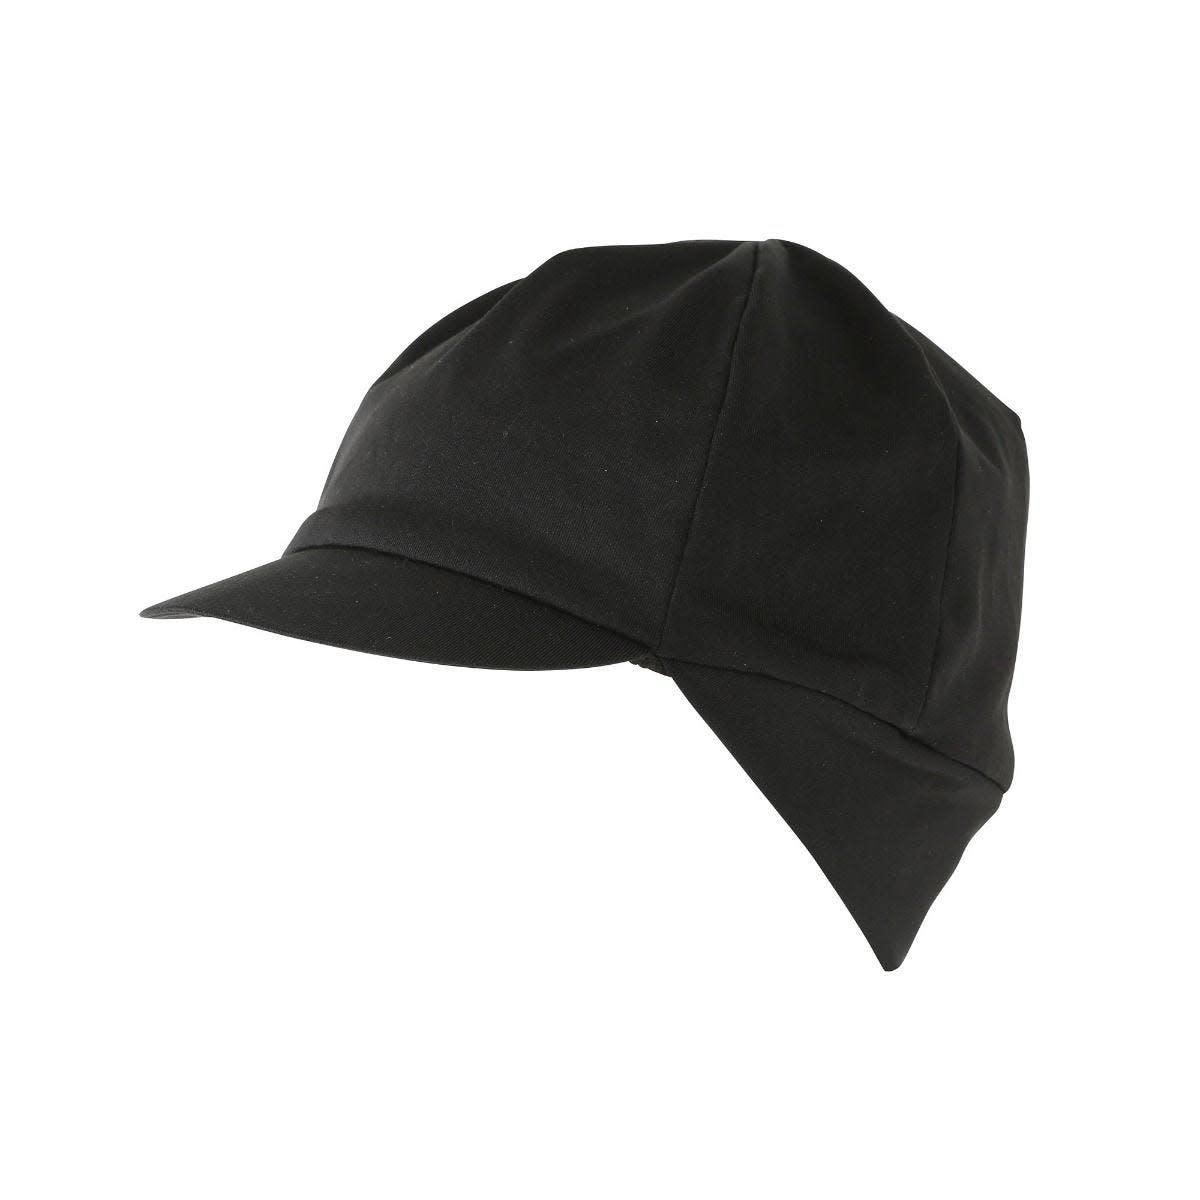 ETC ETC Arid Winter Sports Cap One Size